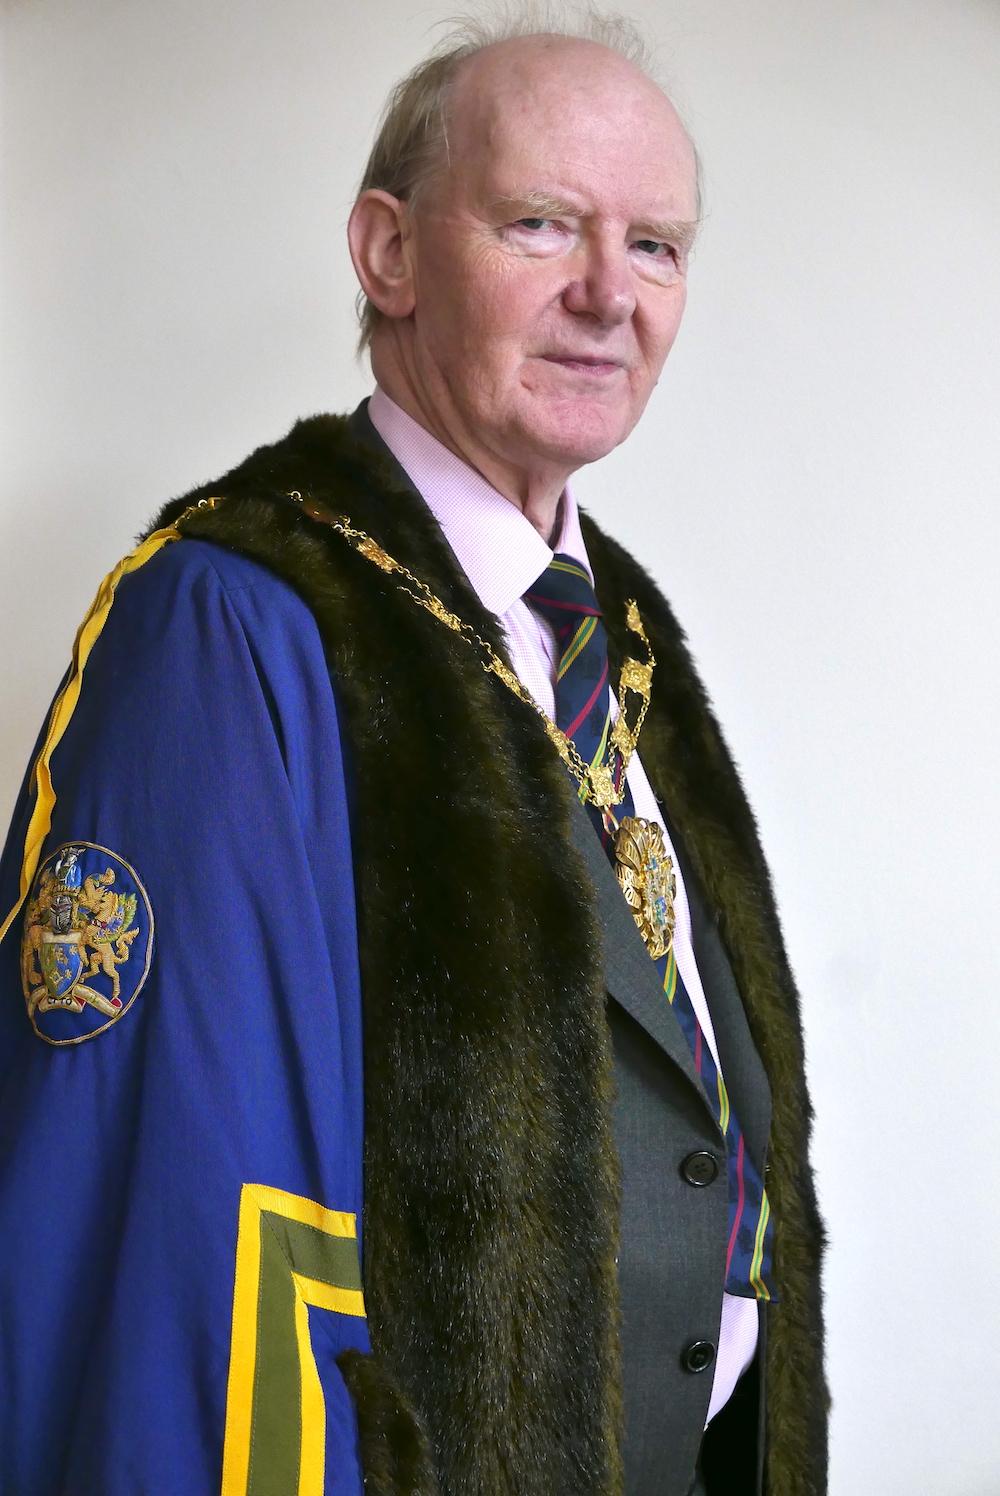 Photo of Mark Holford, The Master